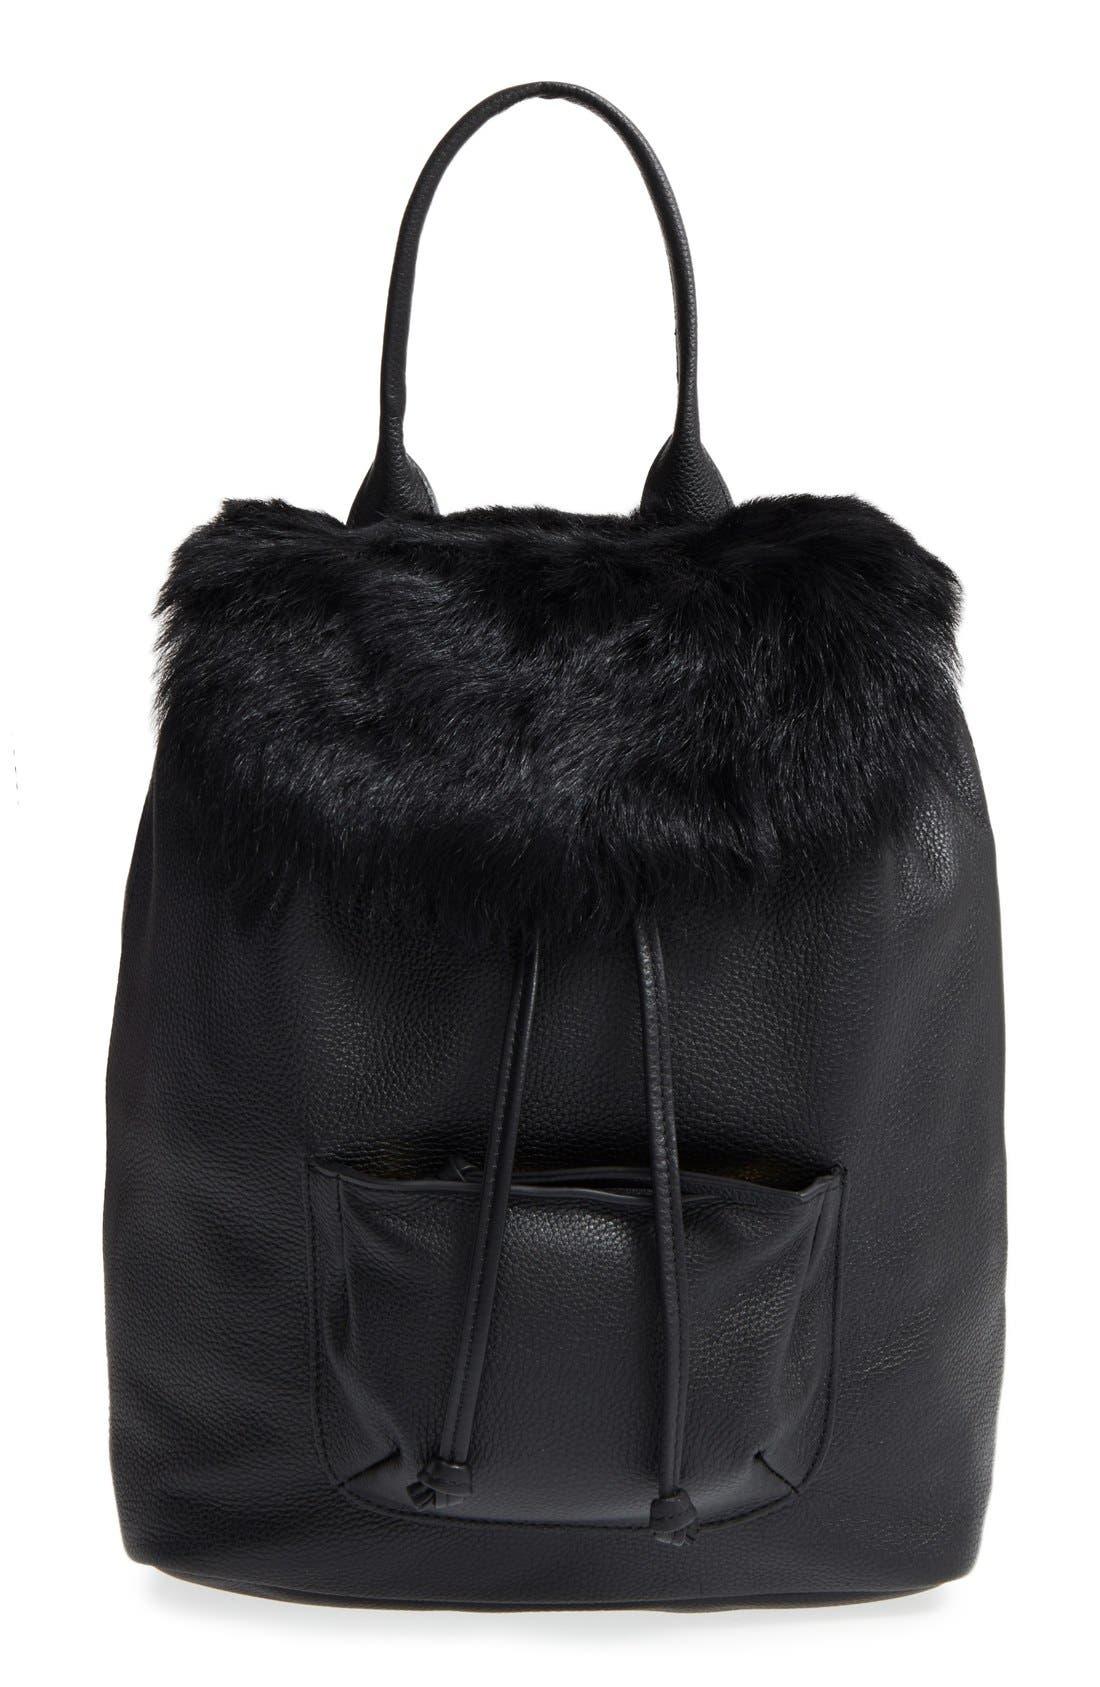 ELIZABETH AND JAMES 'Langley' Leather & Genuine Sheep Fur Backpack, Main, color, 001